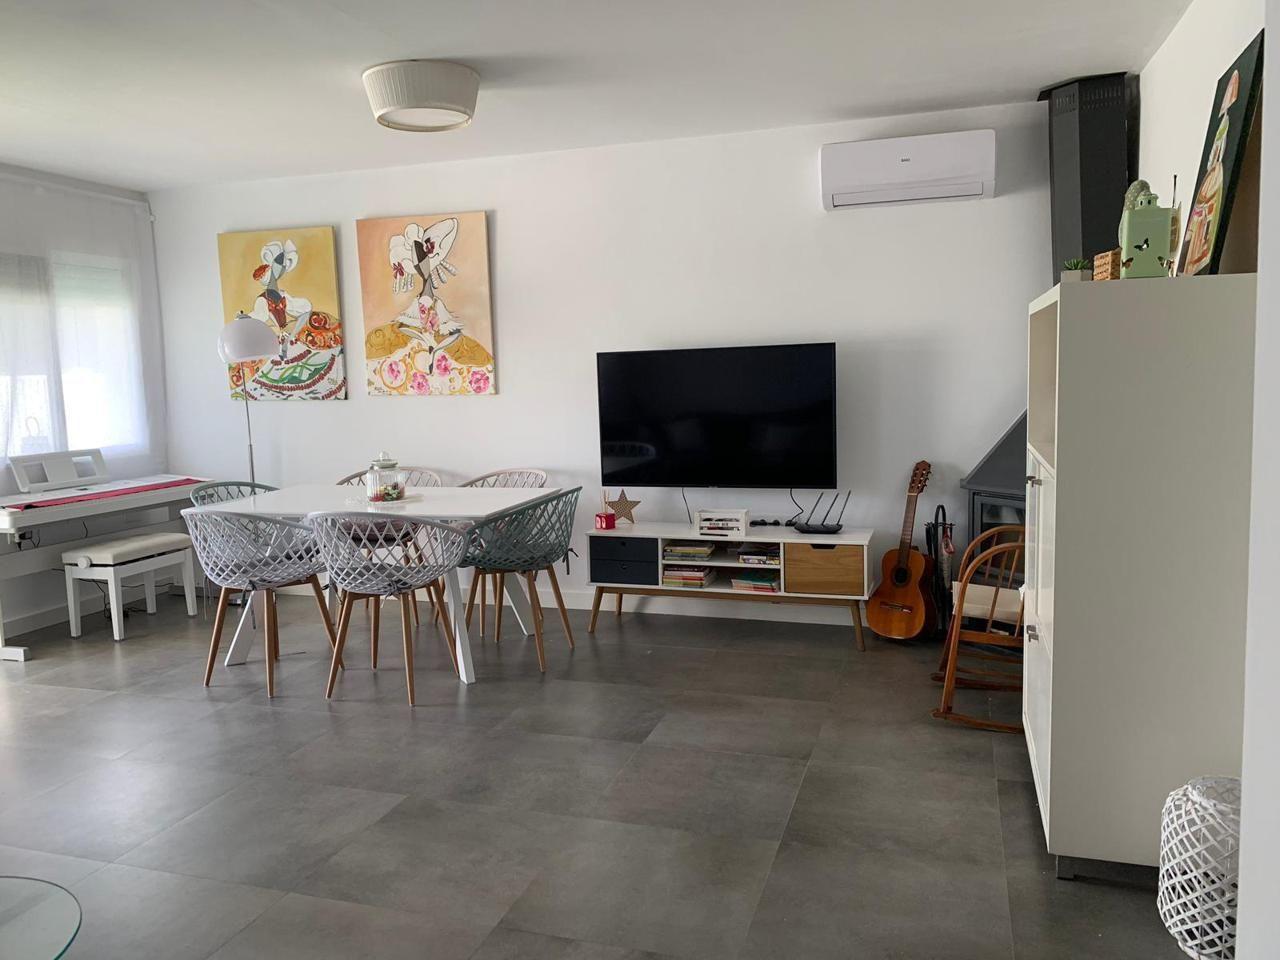 House (4 rooms - 95sqm) in SAN PEDRO DEL PINATAR